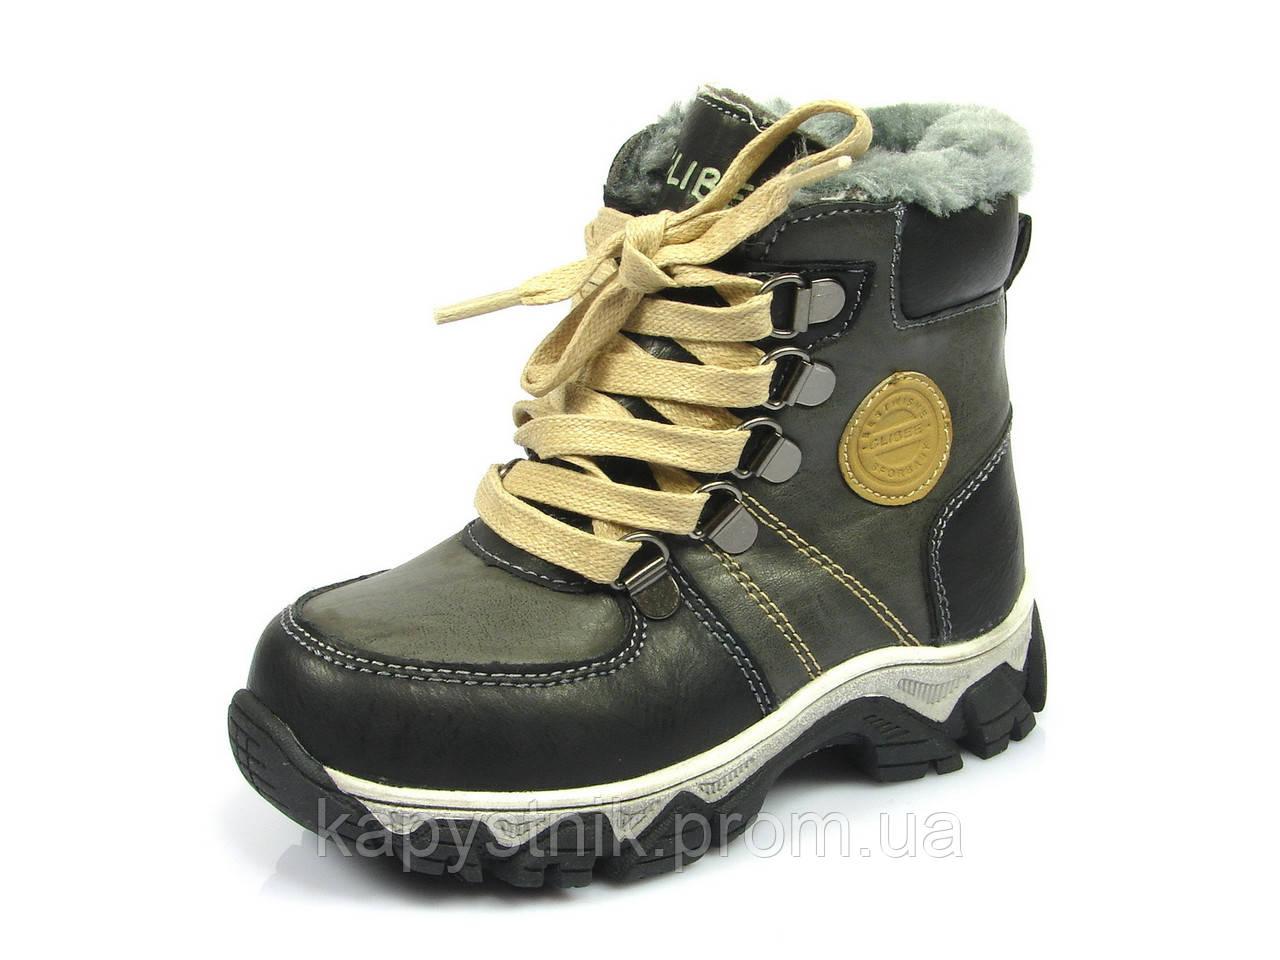 Детские зимние ботинки р.21-26 ТМ Clibee H-98 Черный  продажа 8e51f35385030